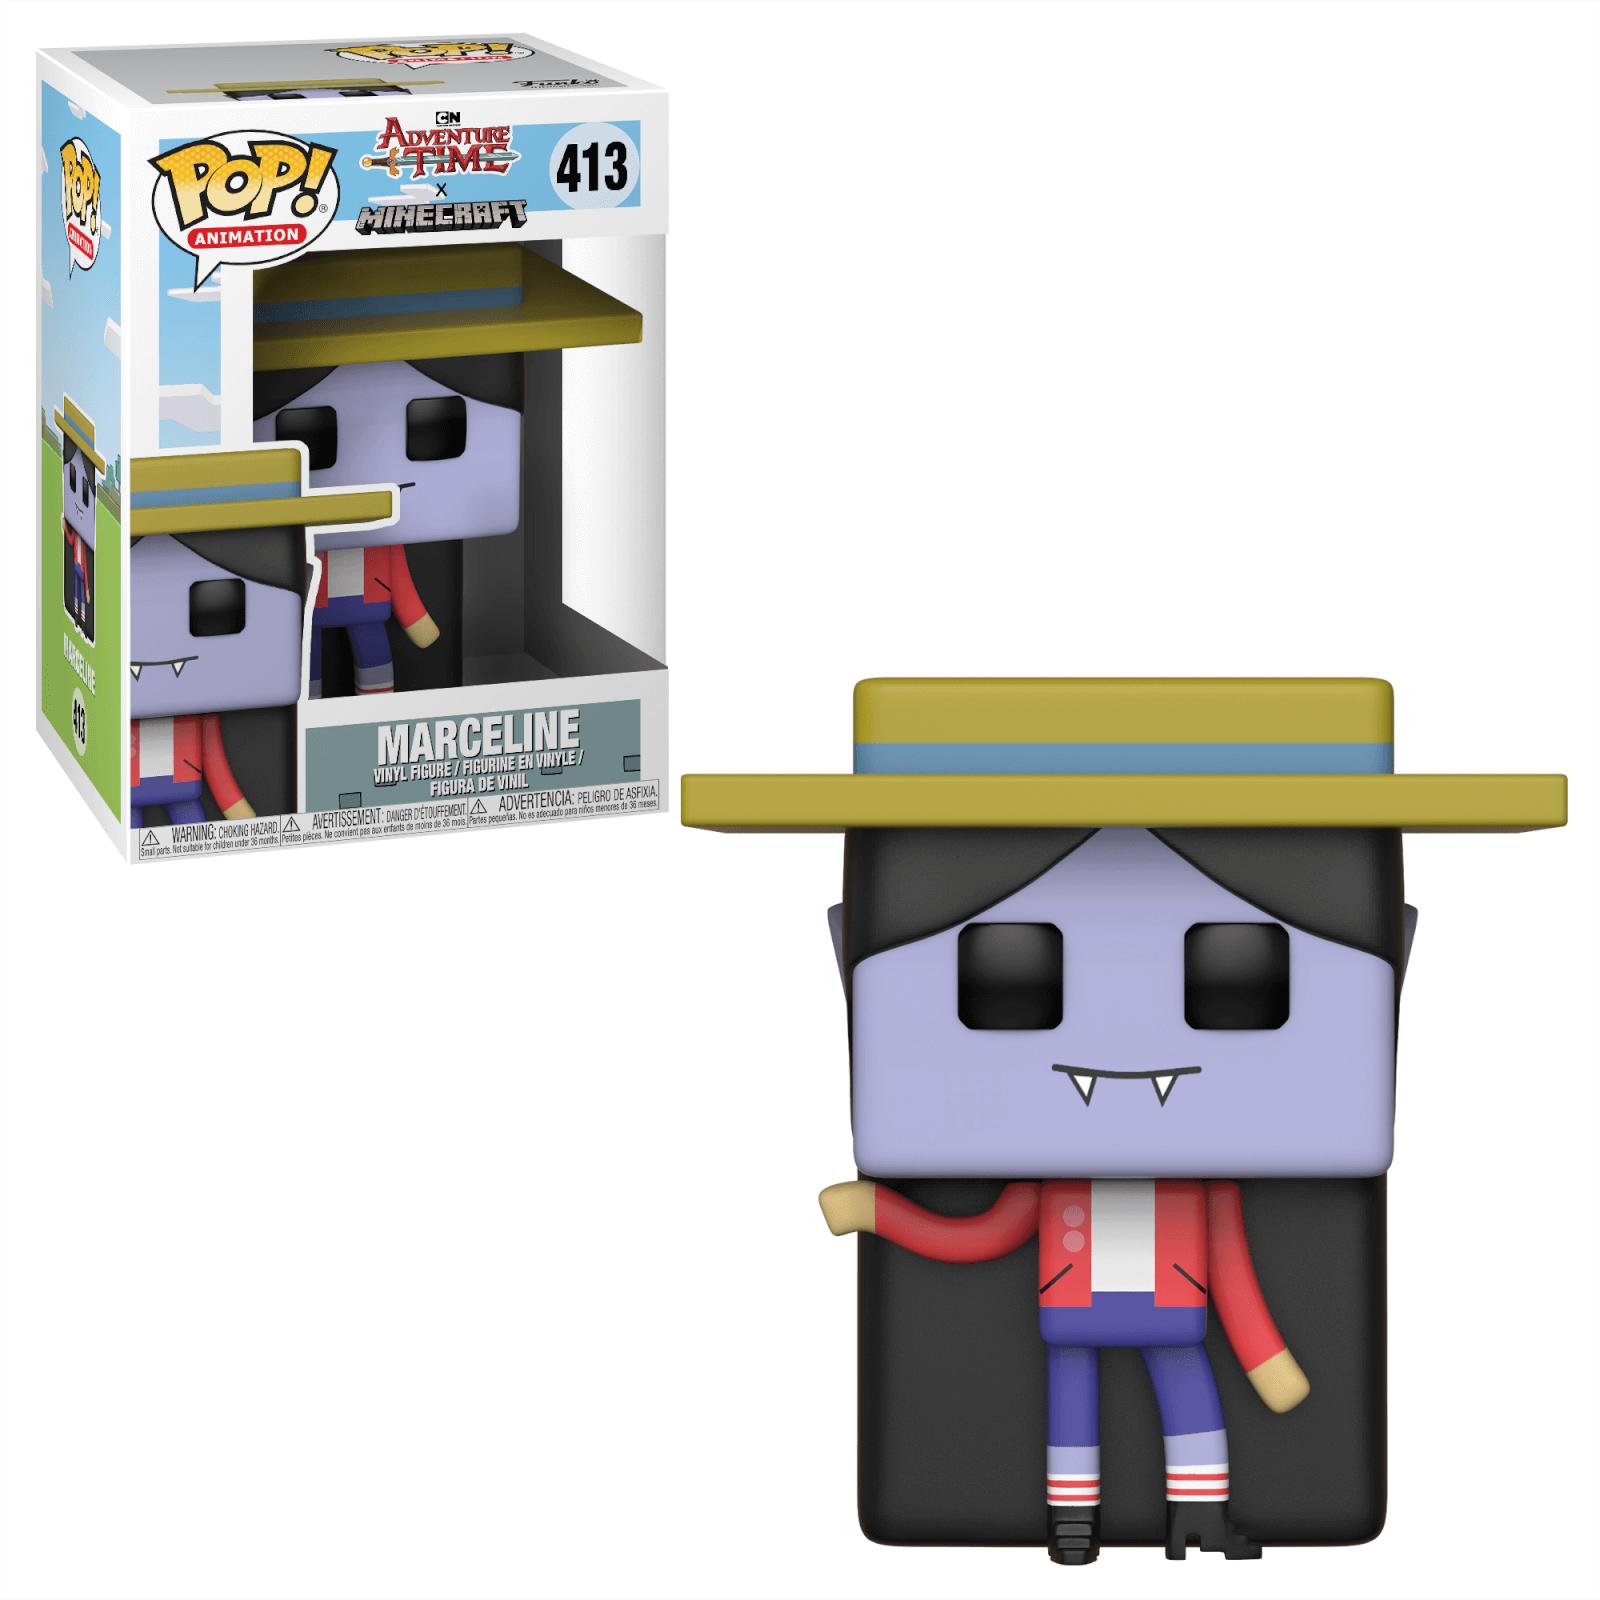 Image of Adventure Time x Minecraft Marceline Pop! Vinyl Figure